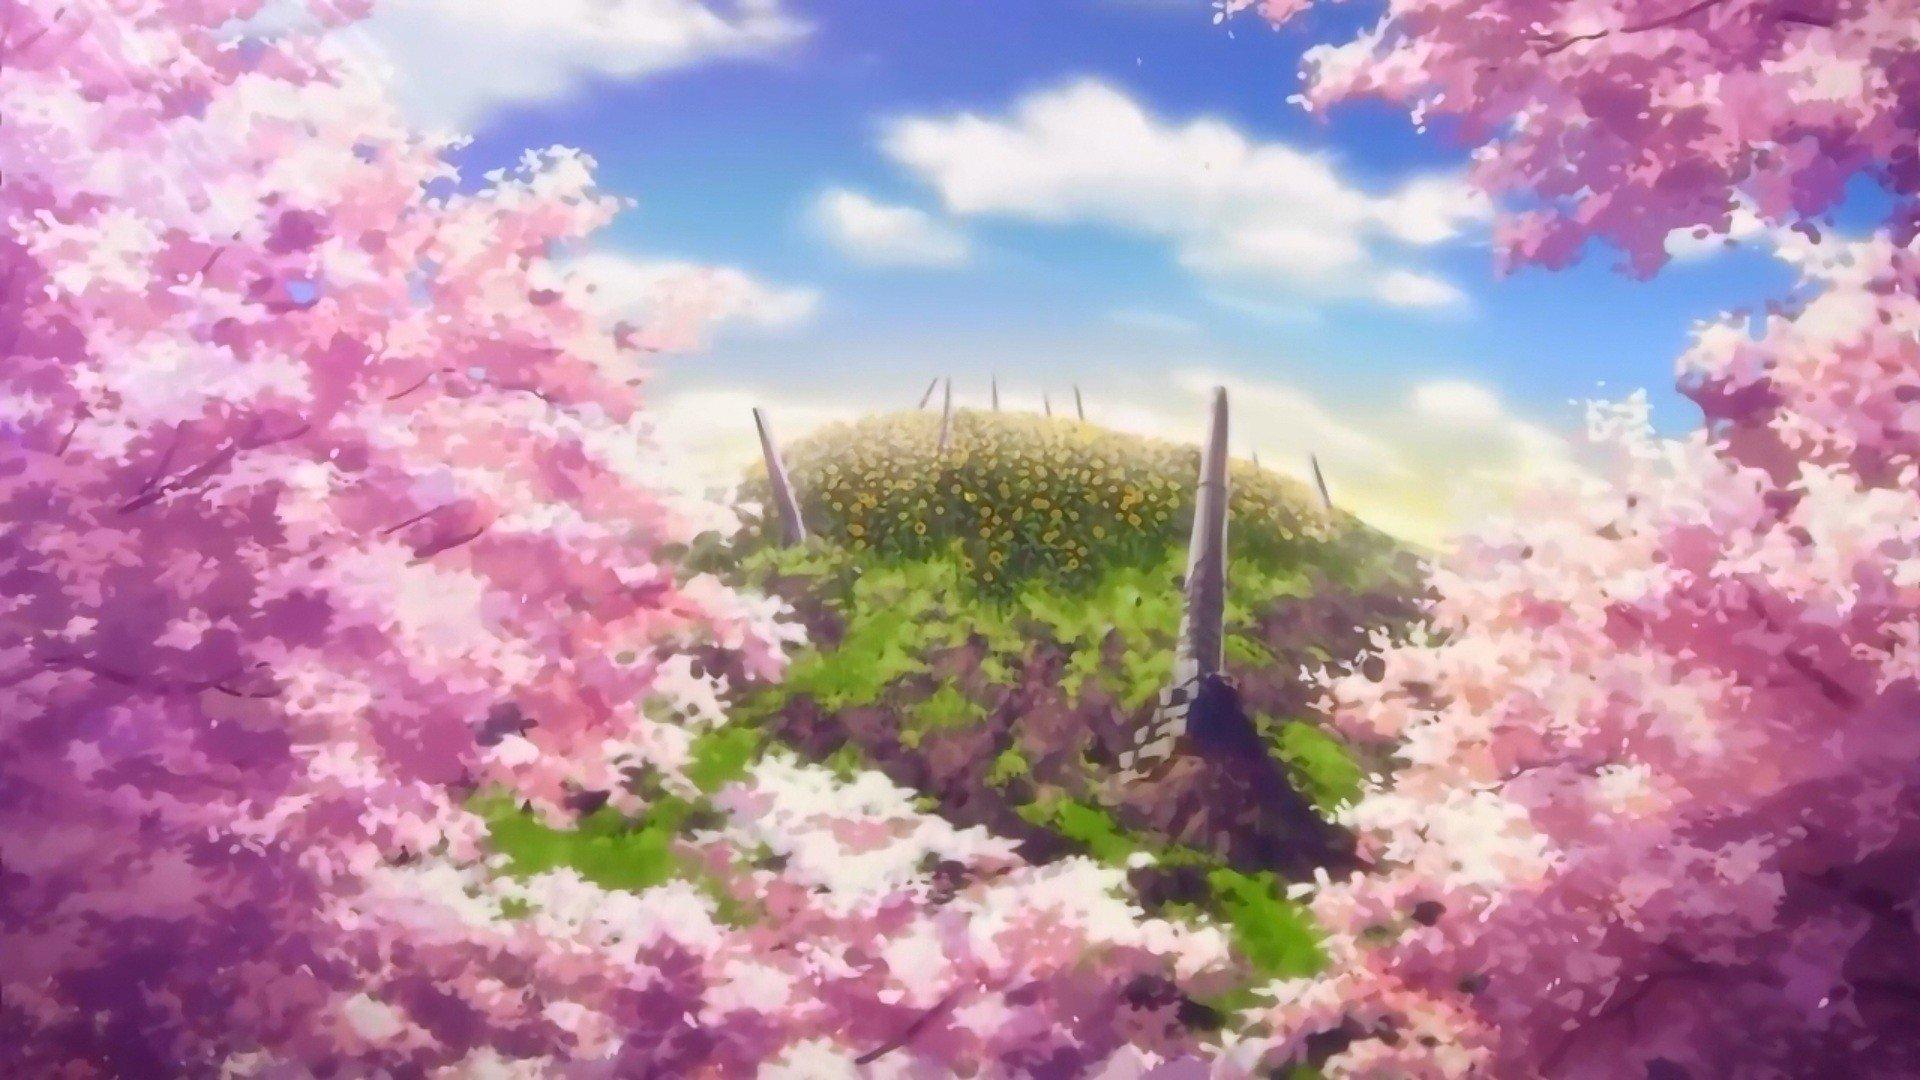 clouds cherry blossoms hills anime cherry tree sun rays sun flower wallpaper